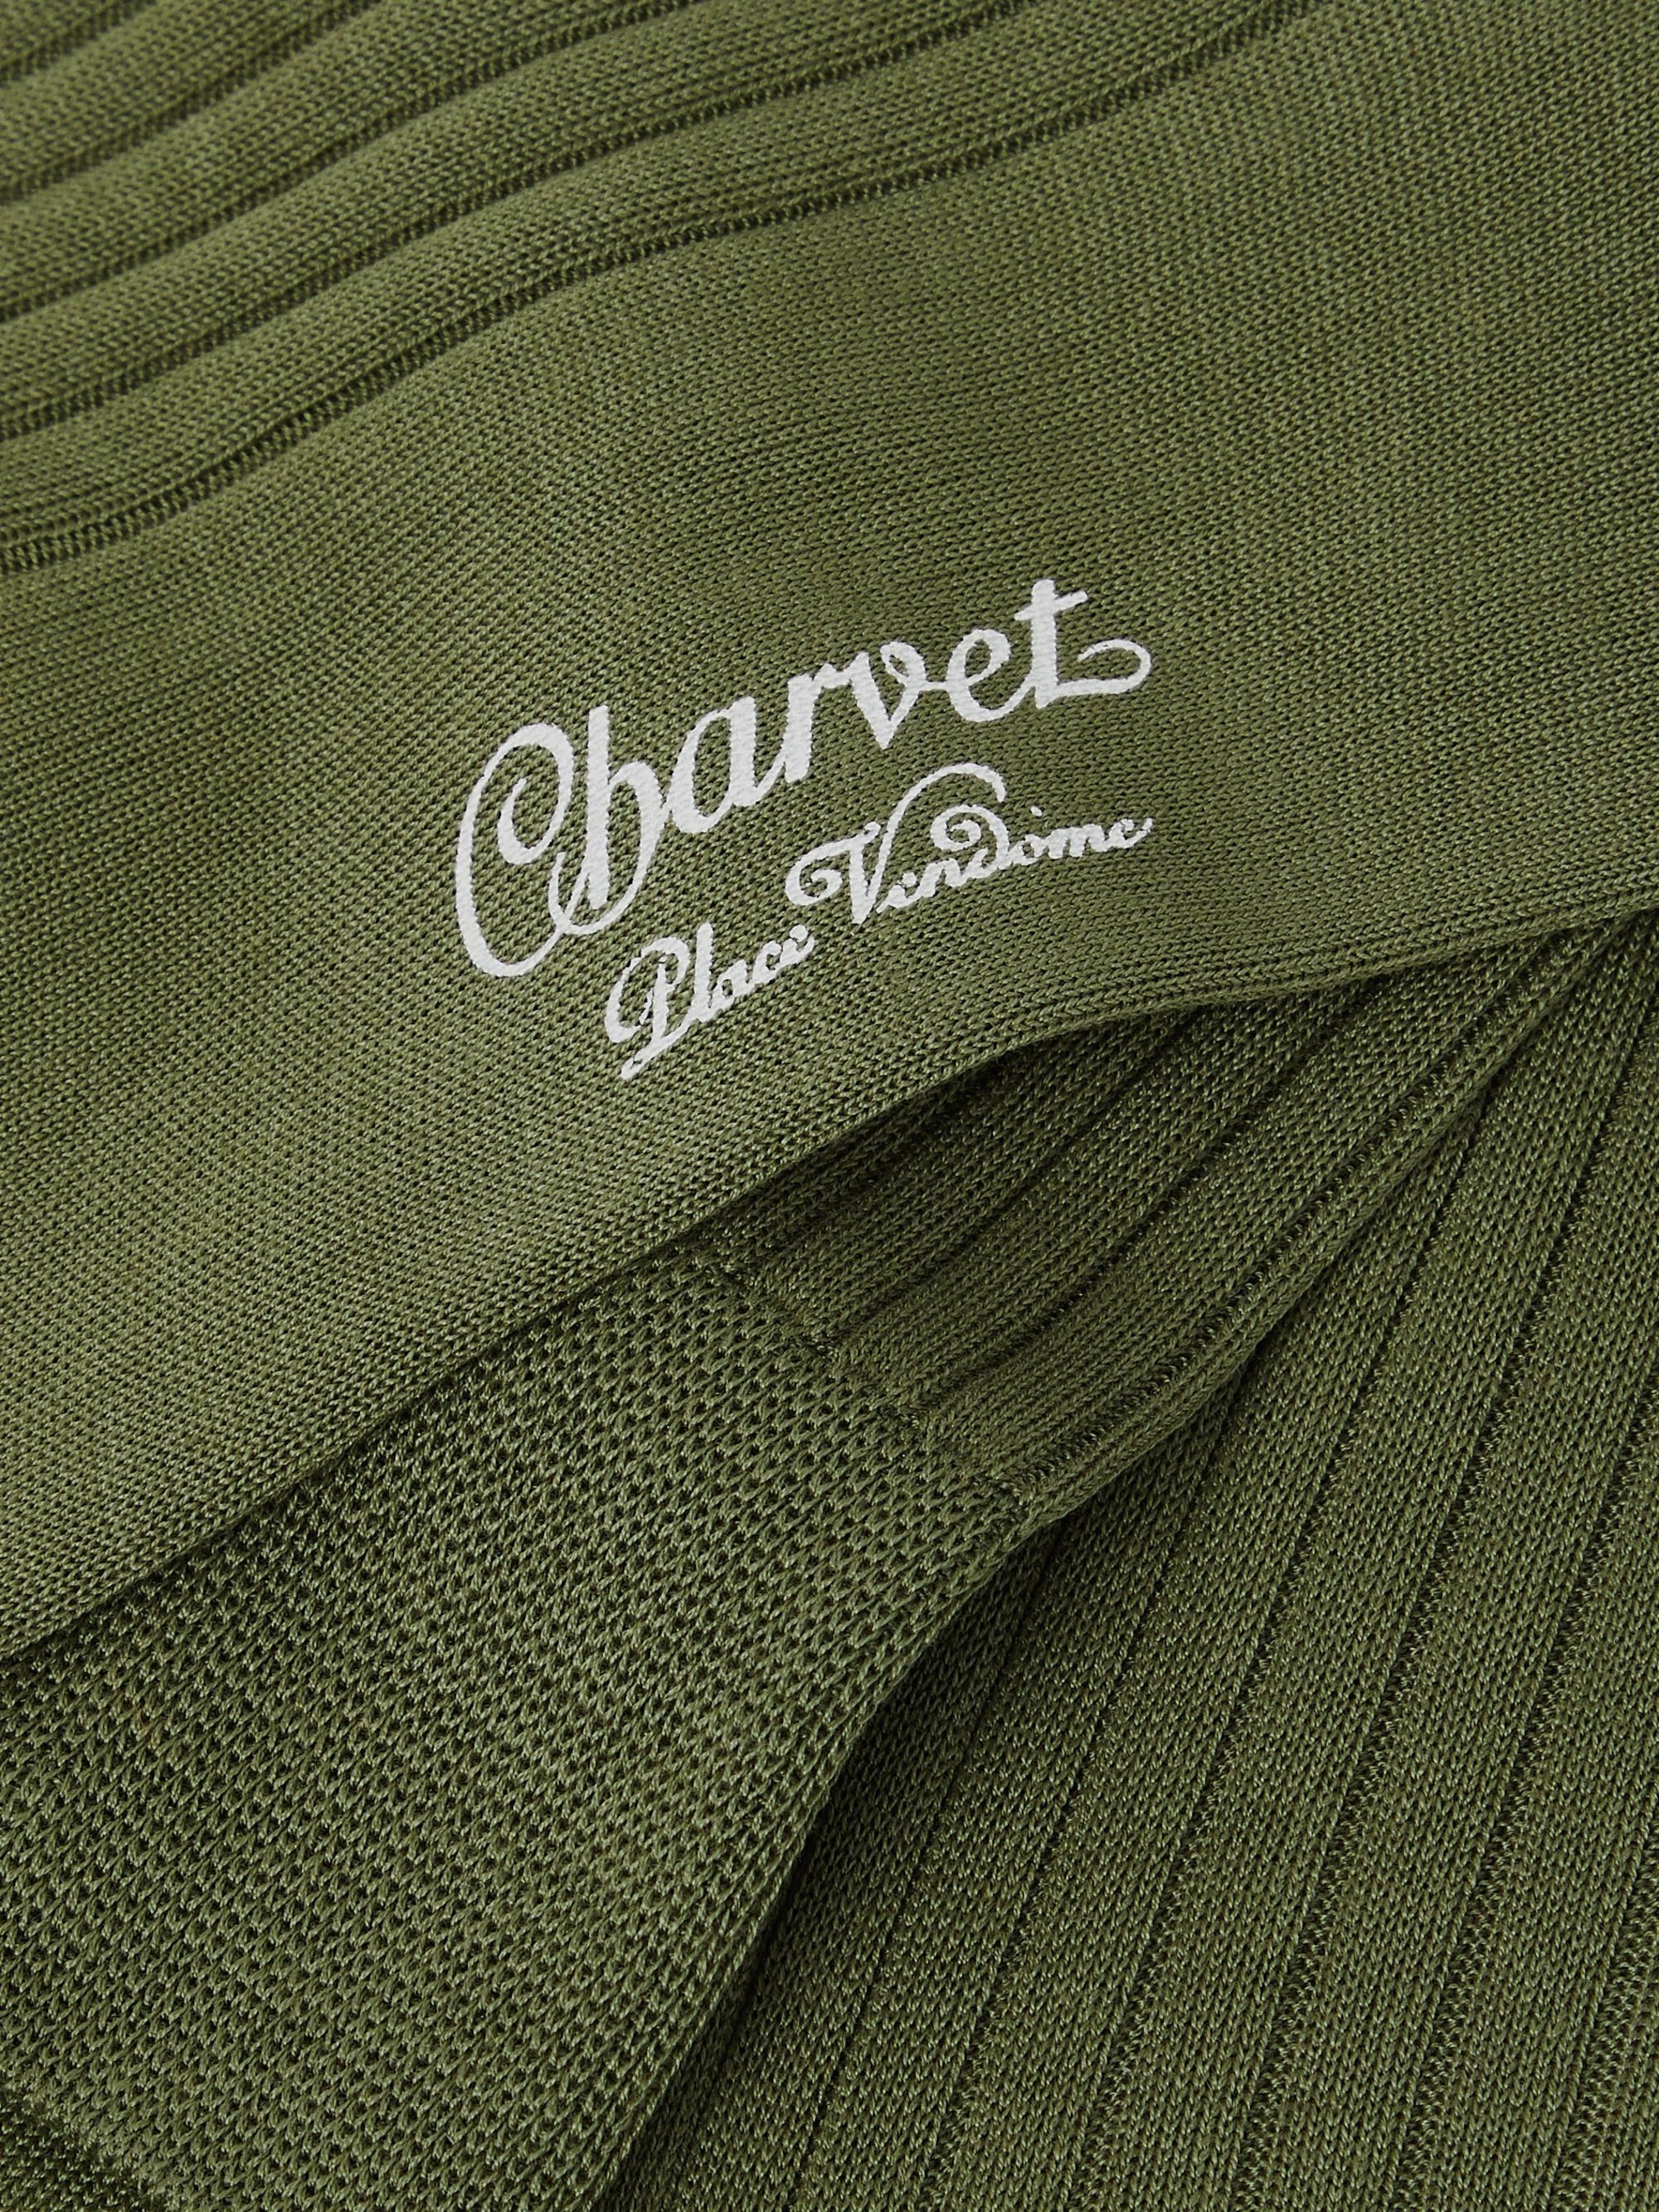 Army Green Ribbed Cotton Socks | Charvet